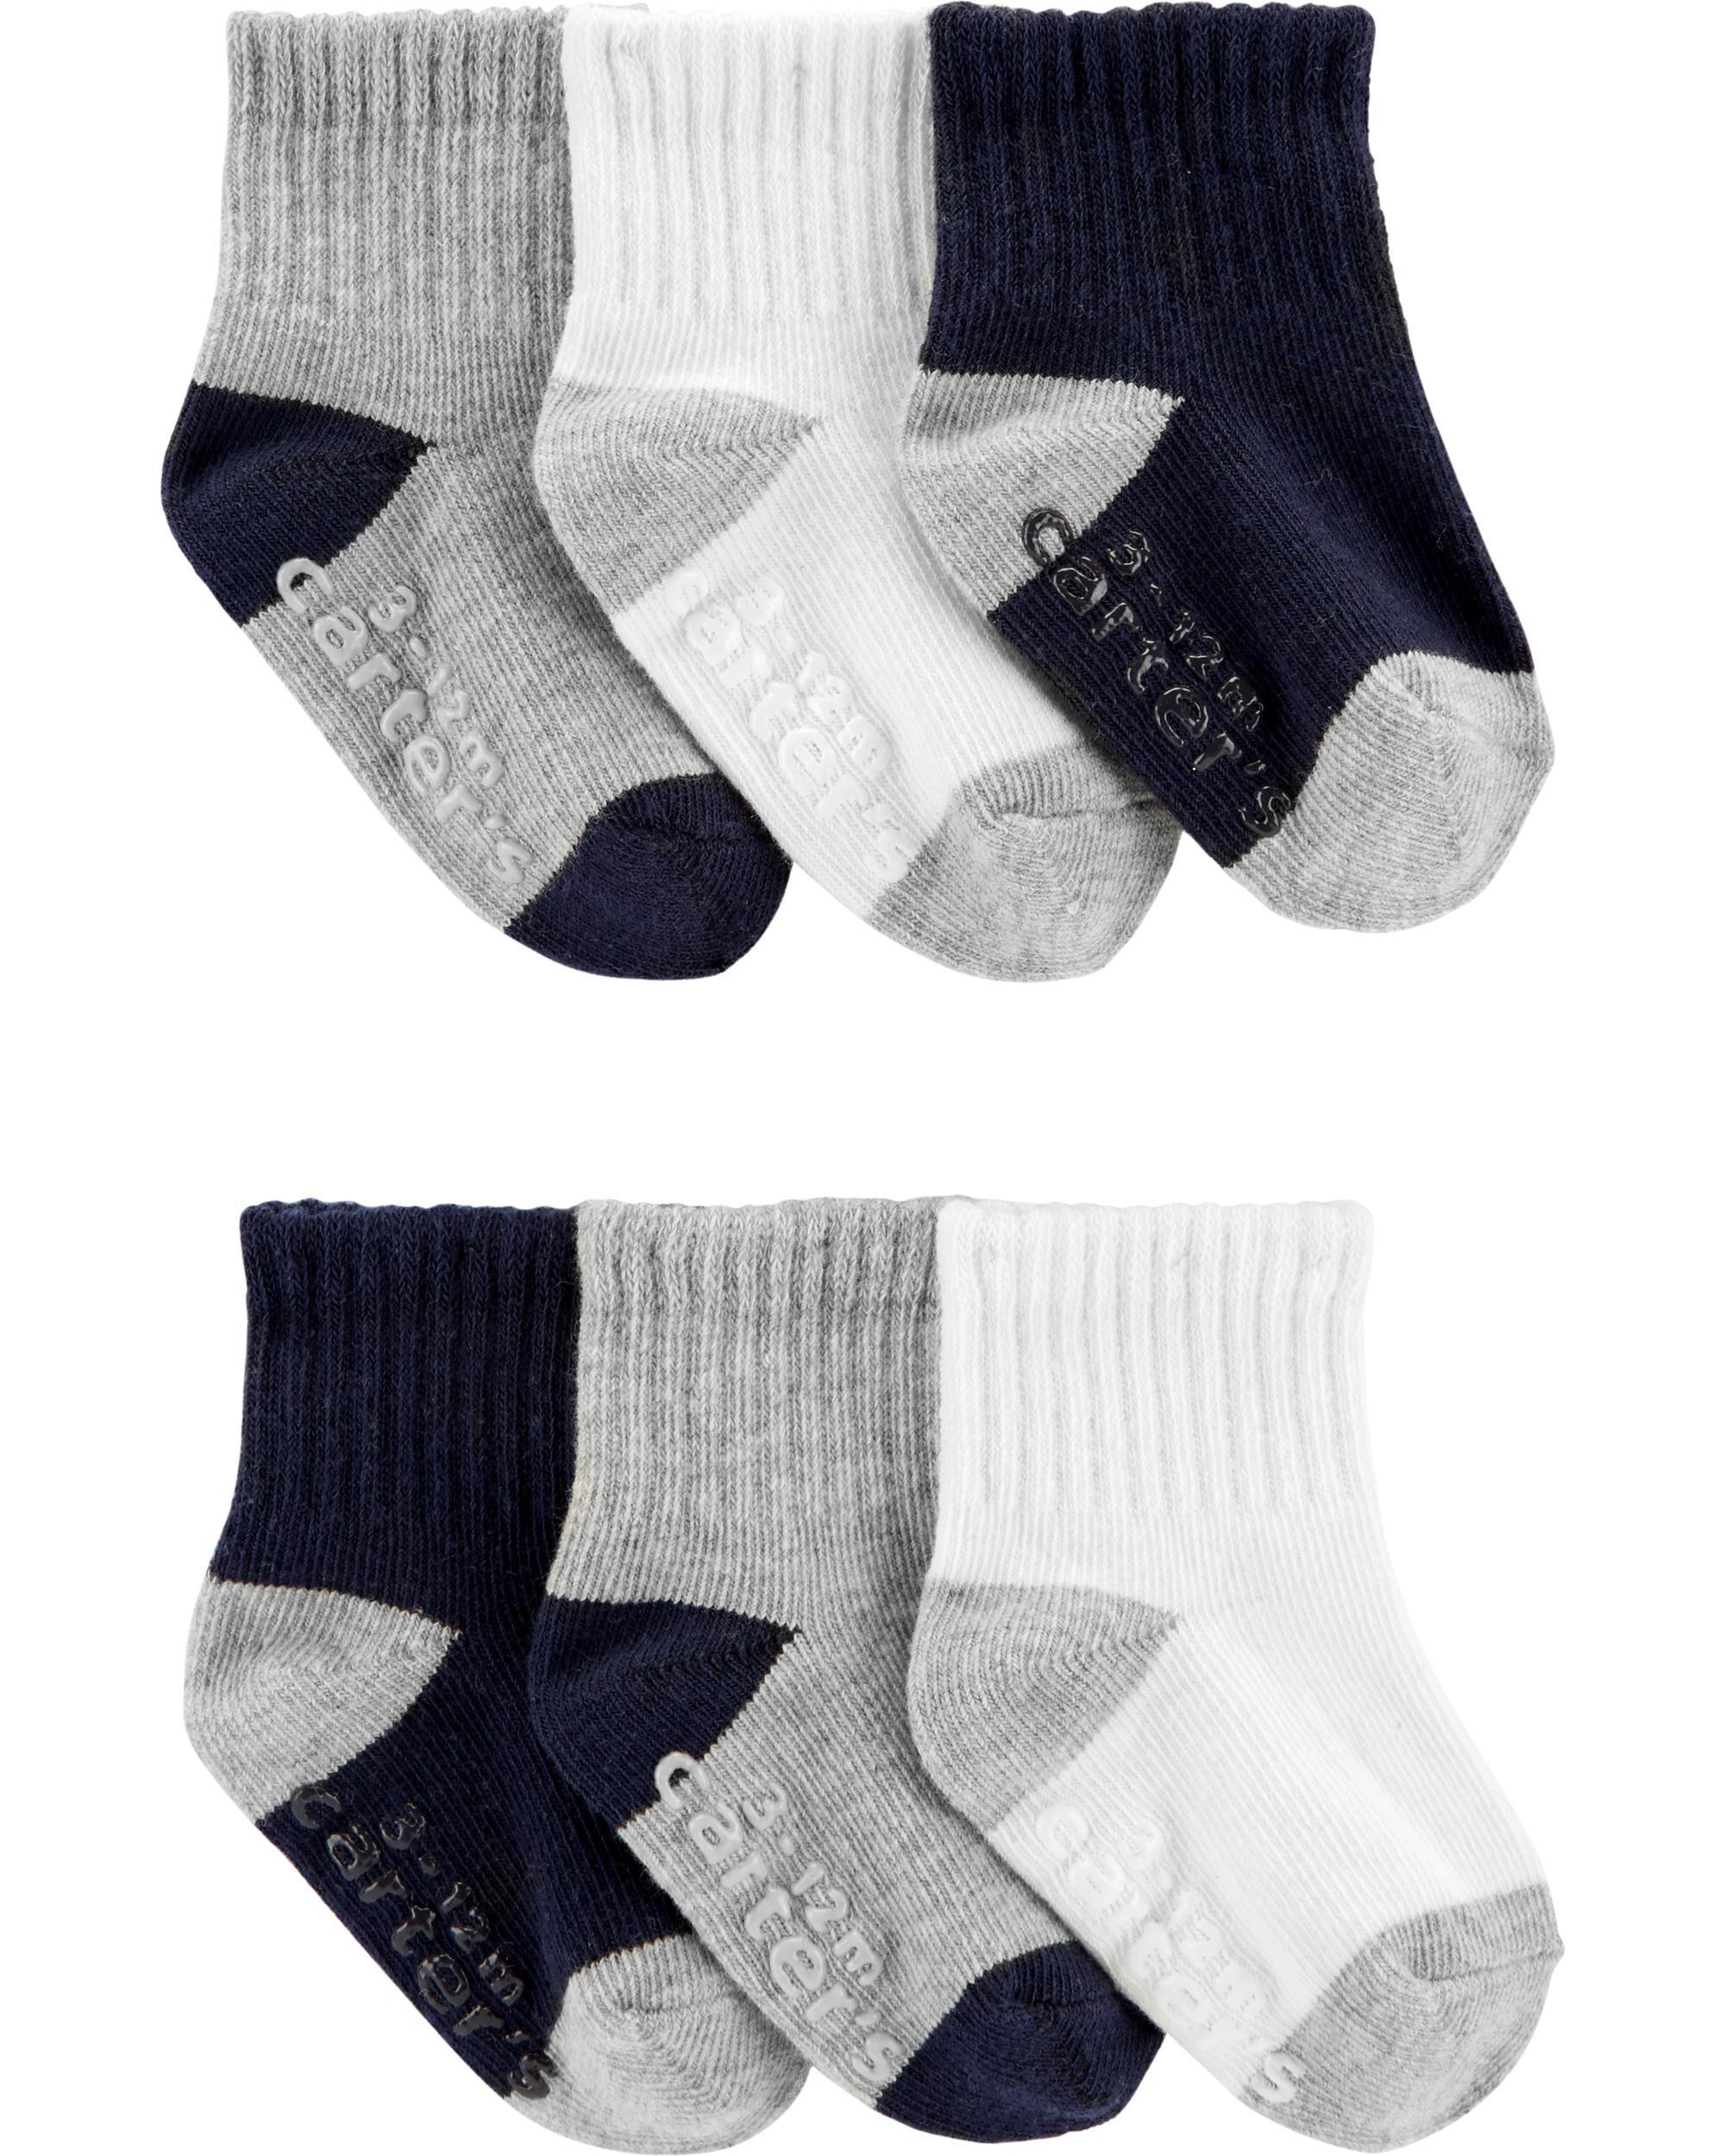 3 sizes Baby Boys Fun Zoo Animals cotton socks Pack of 6 Pairs